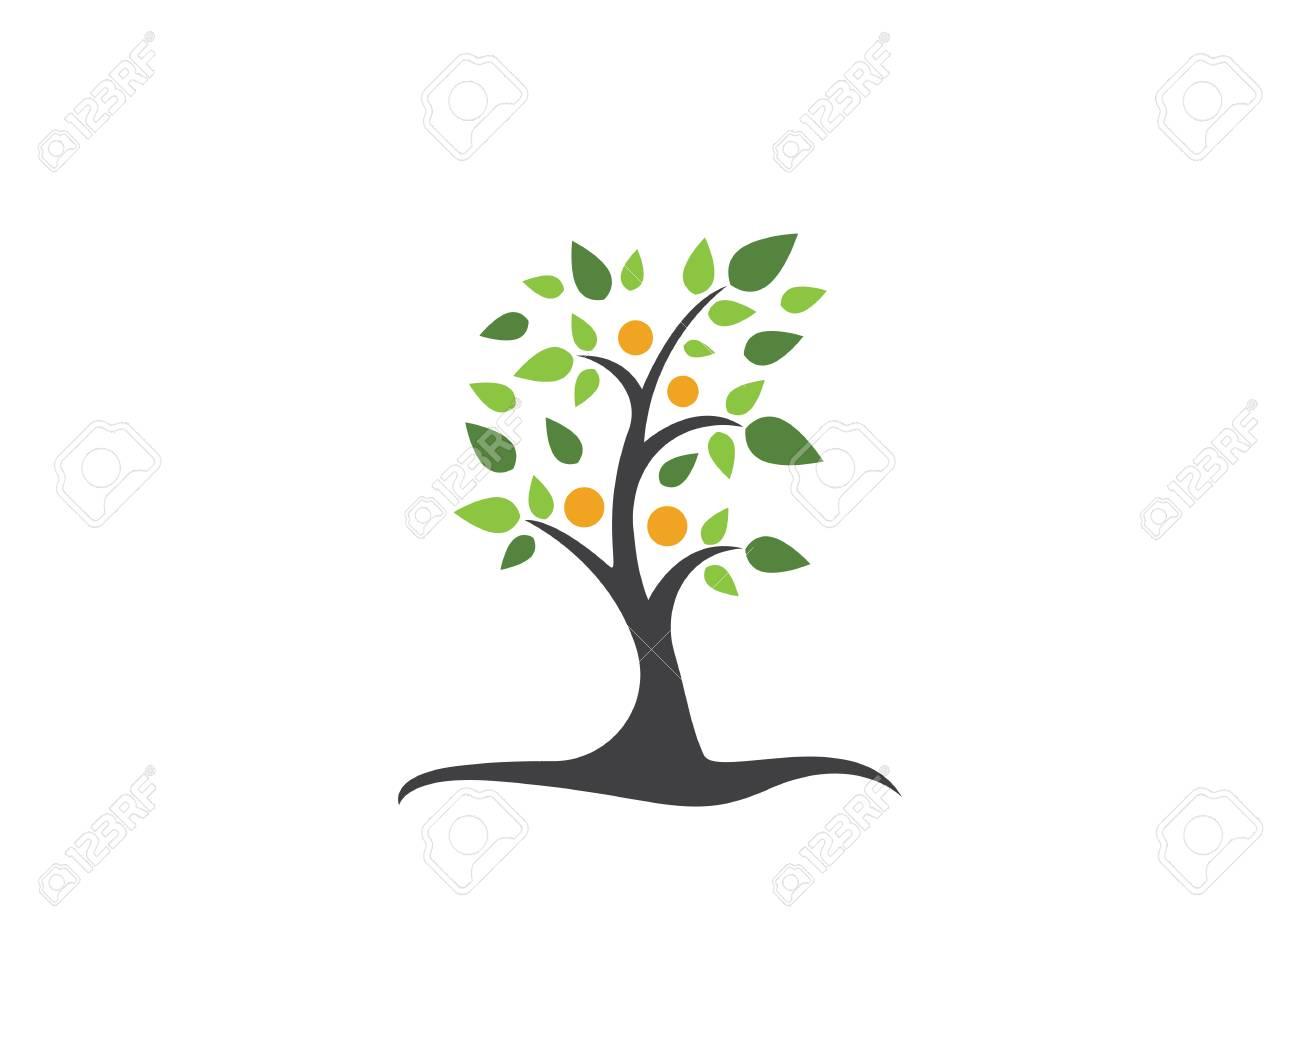 Family tree symbol icon logo design template illustration. - 87749250